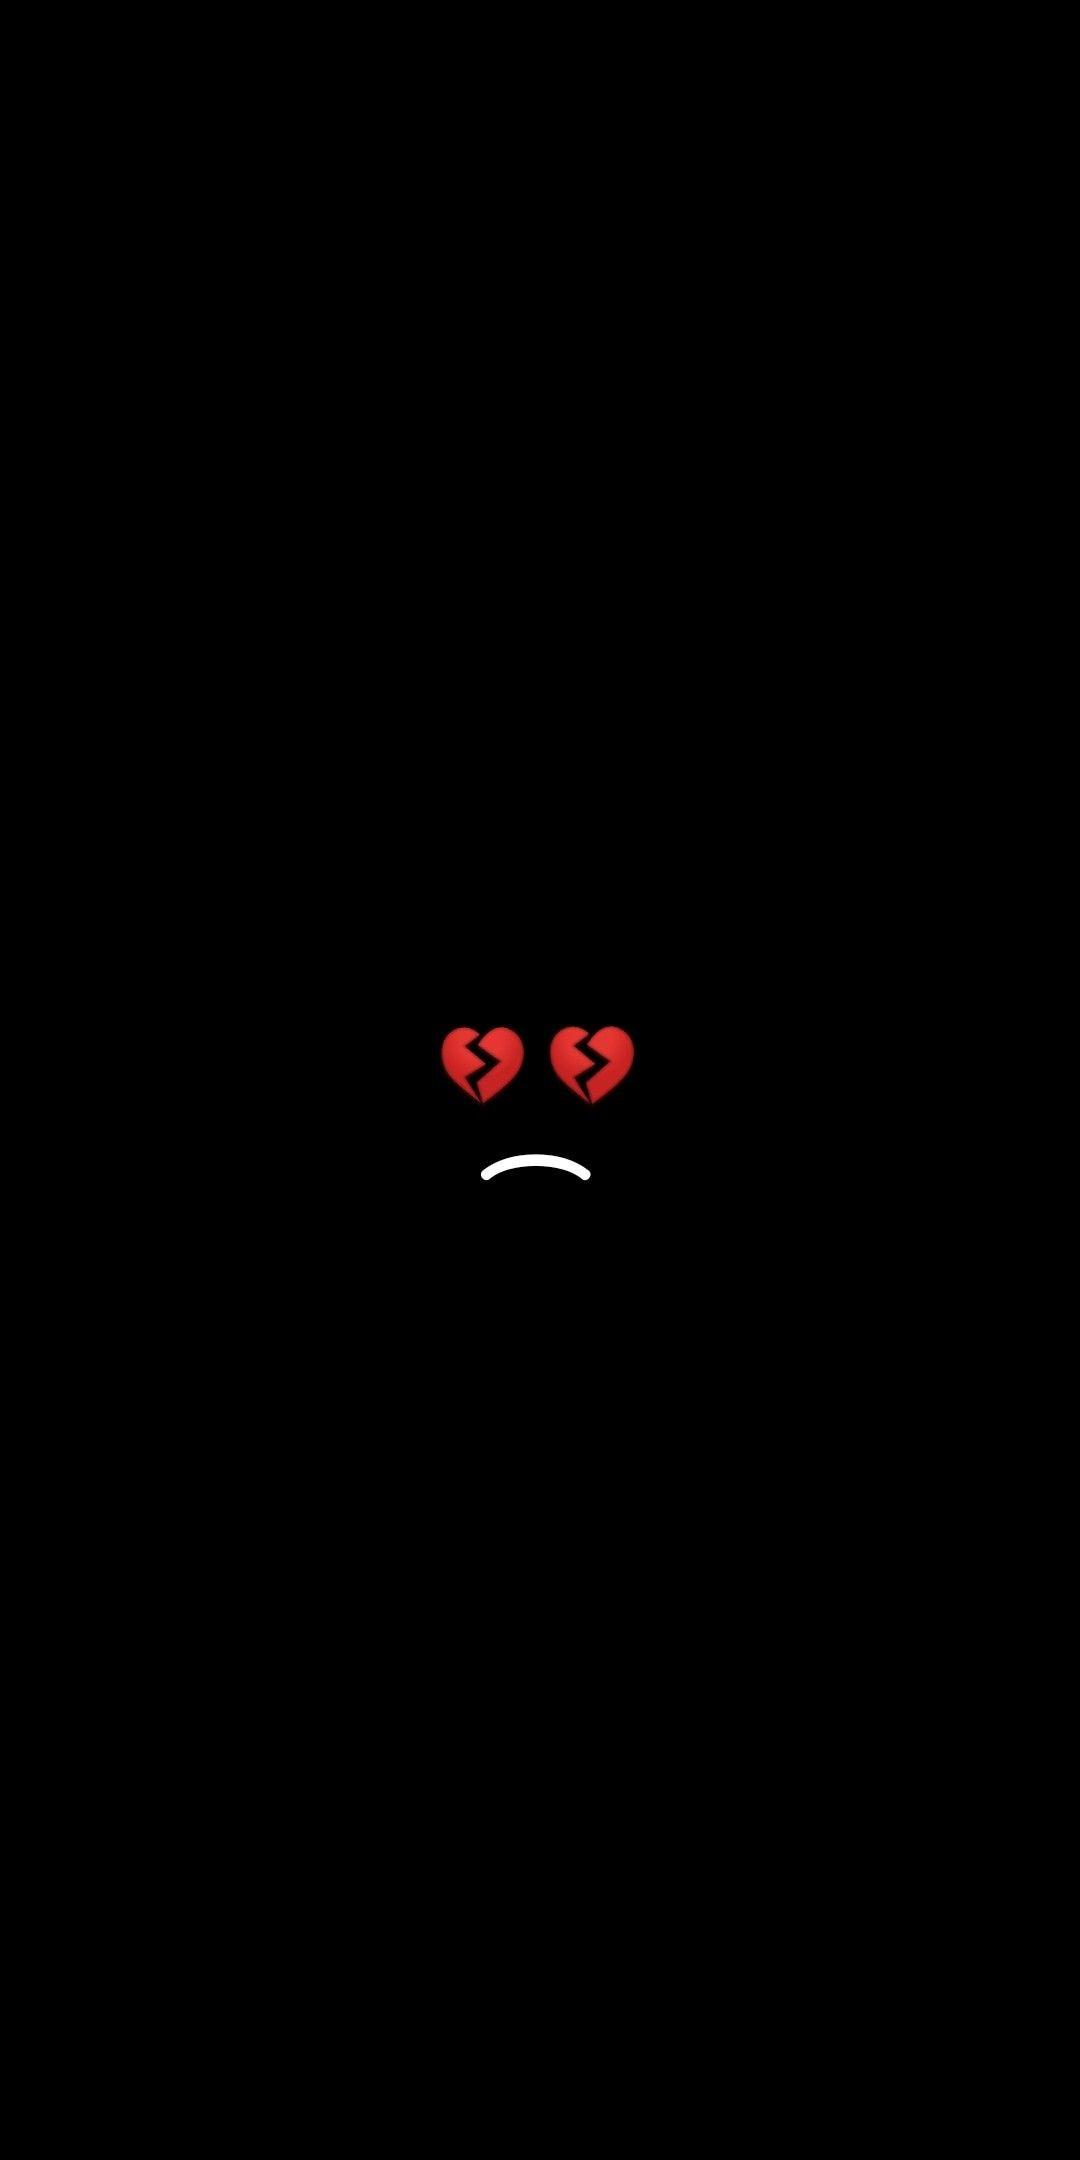 Download Wallpaper Emoji Sad HD Cikimm.com